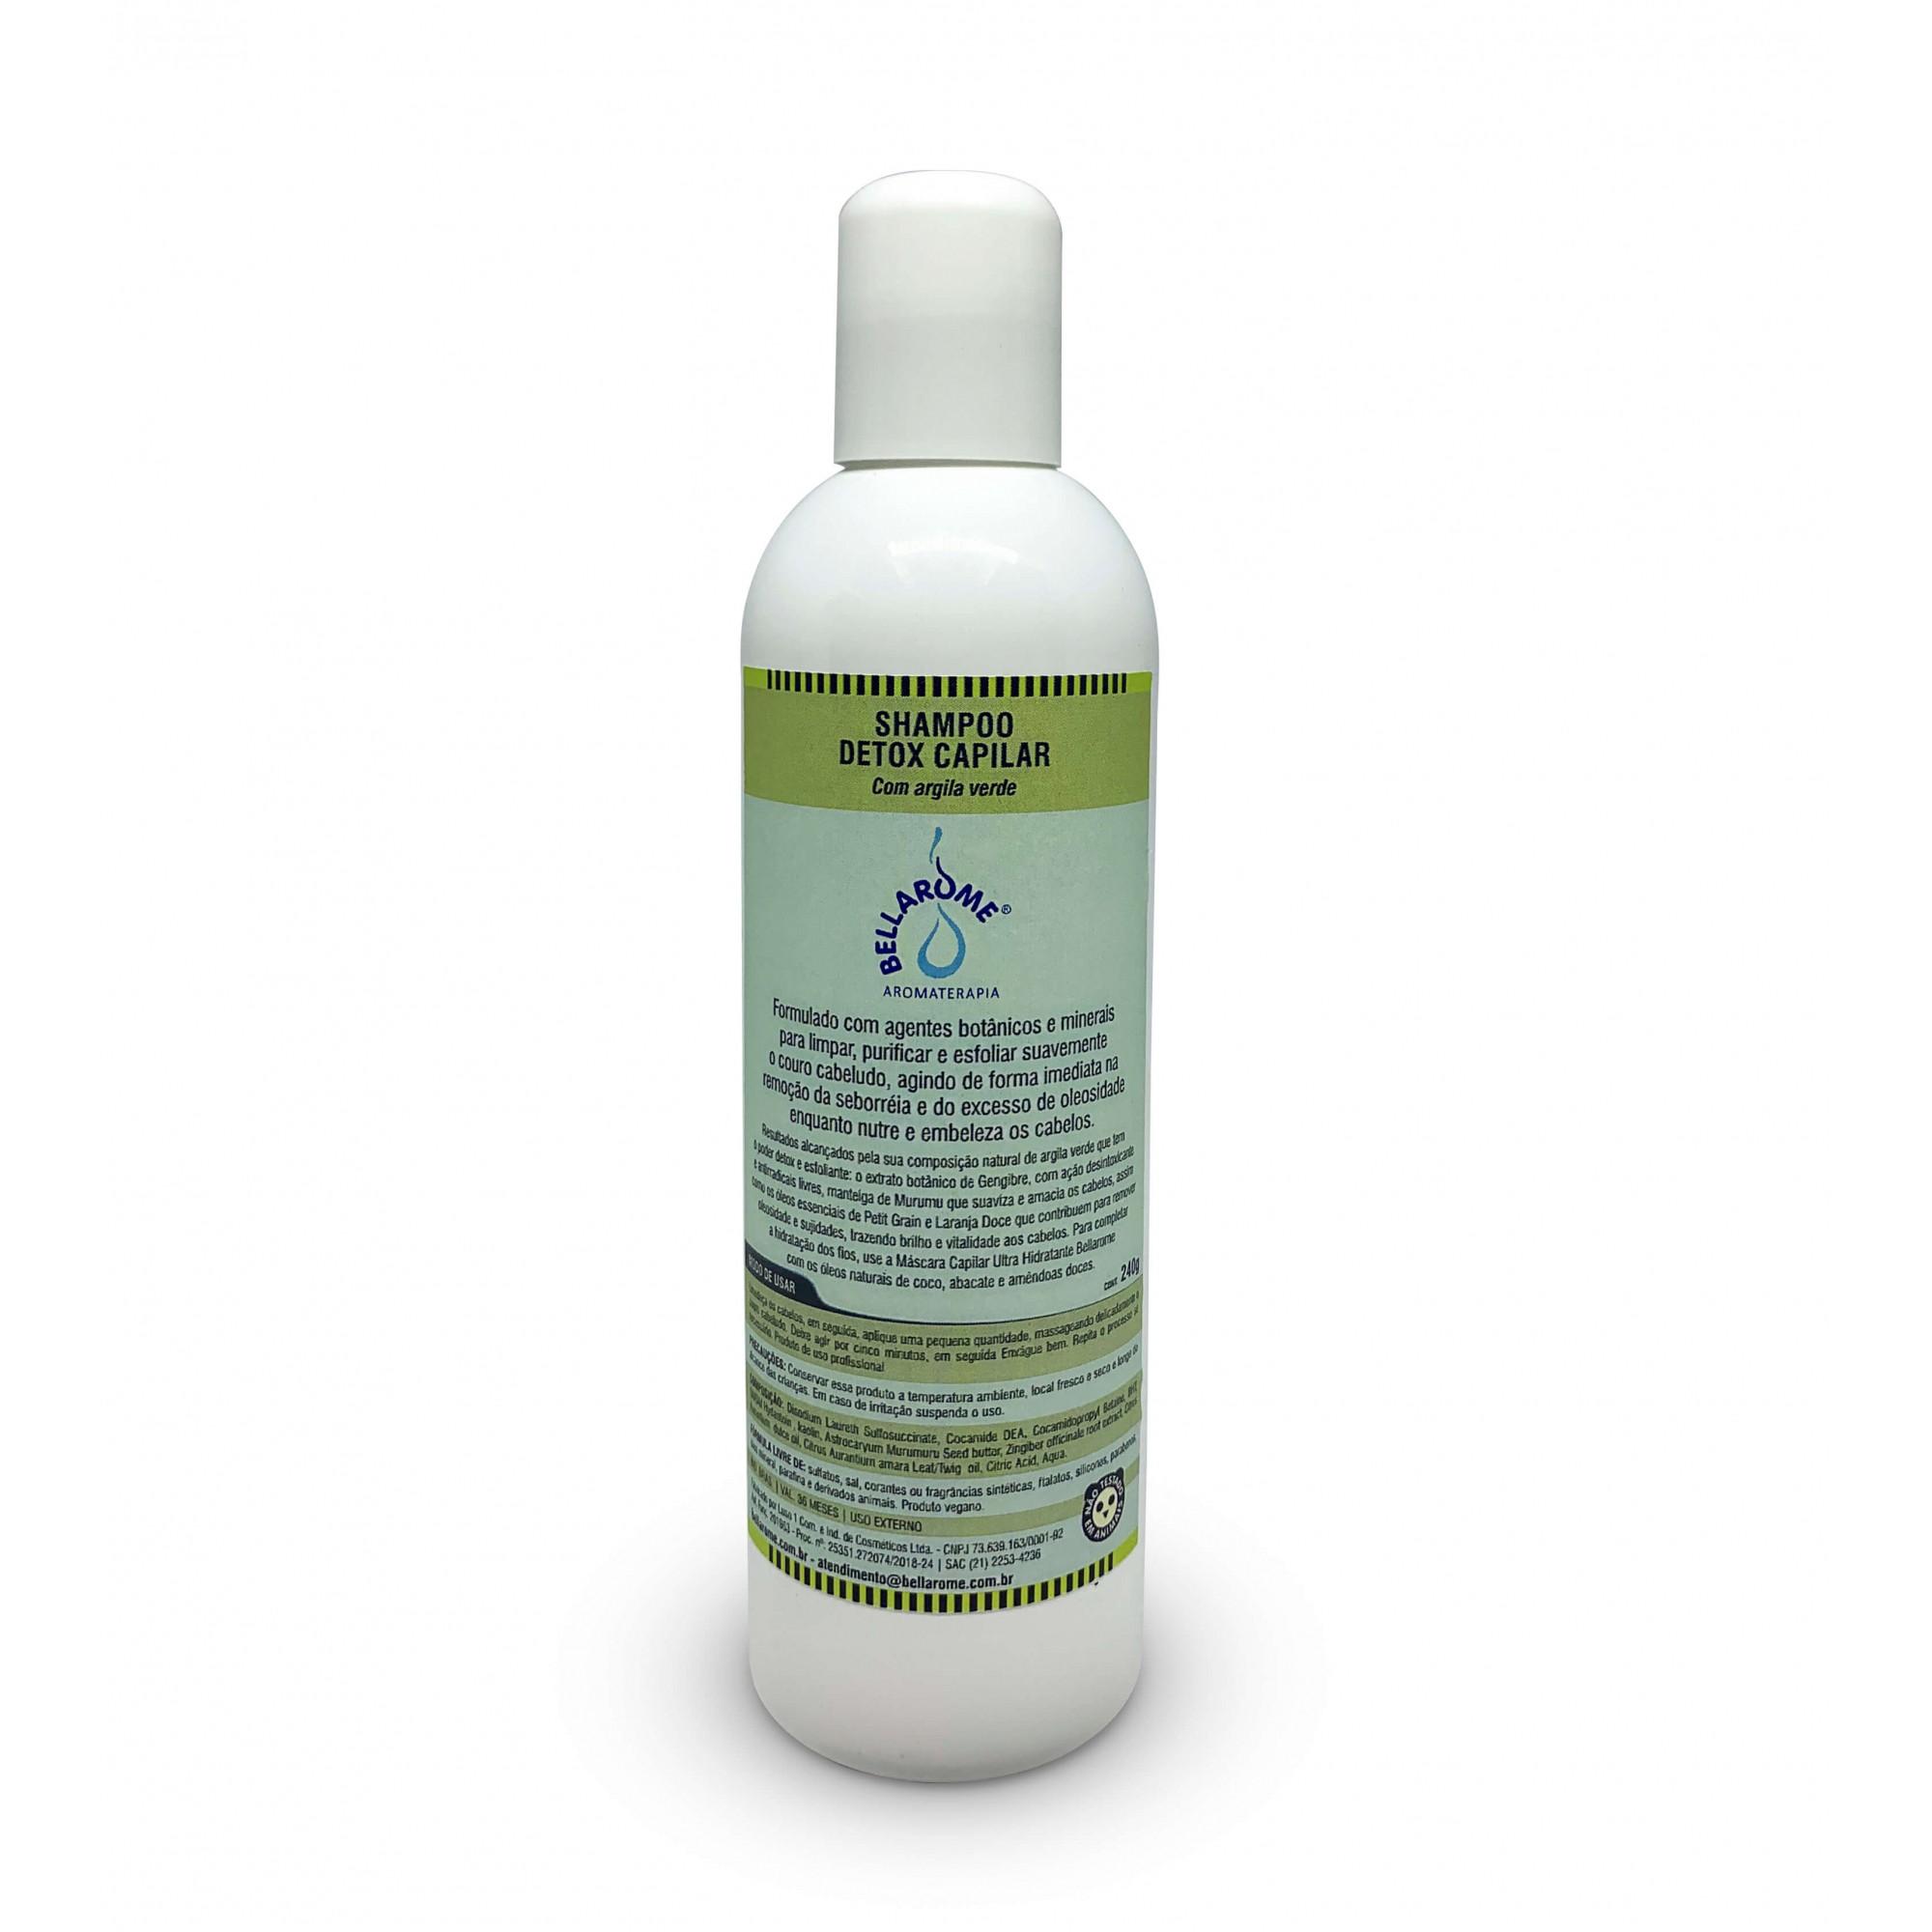 Shampoo Detox Capilar - 240ml  - Bellarome Aromaterapia